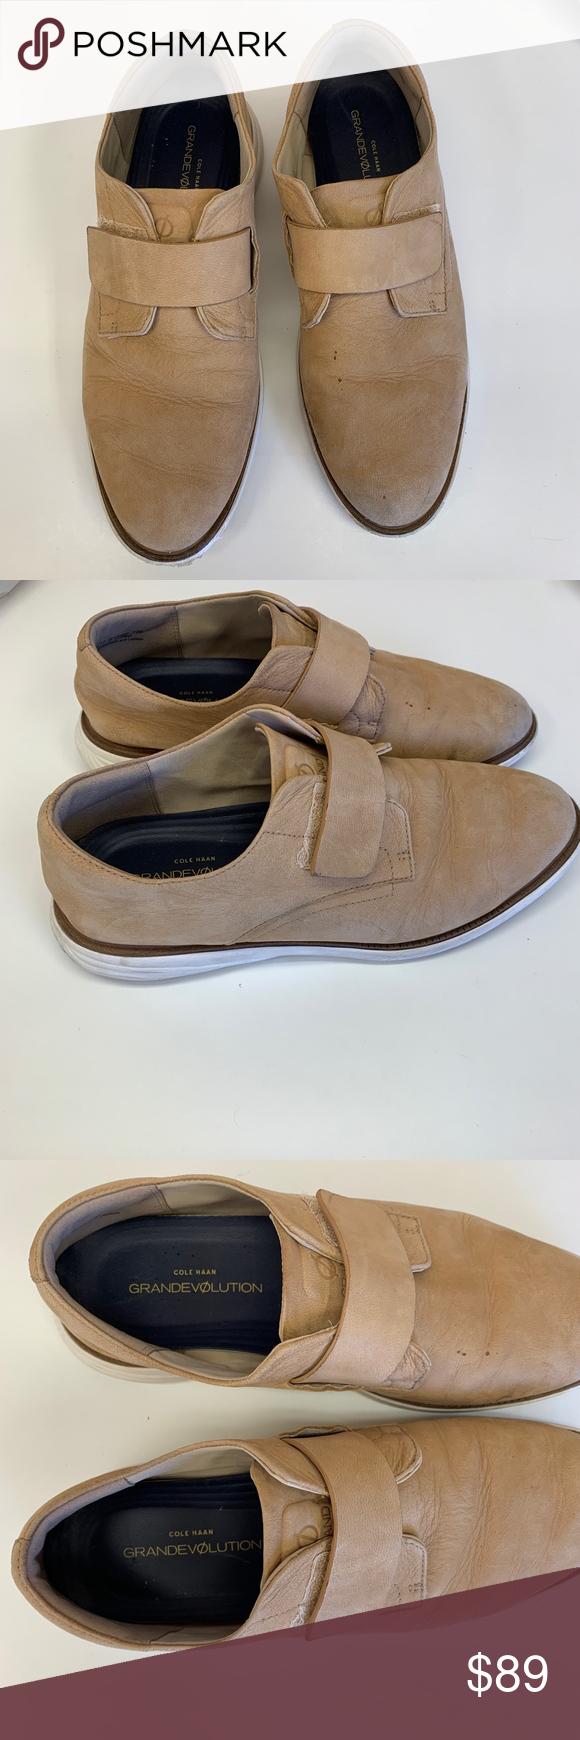 db4a042fc67 Cole Haan GrandEvOlution Modern Monk Sneakers Cole Haan Women s  GrandEvOlution Modern Monk Sneakers Iced Coffee Brown